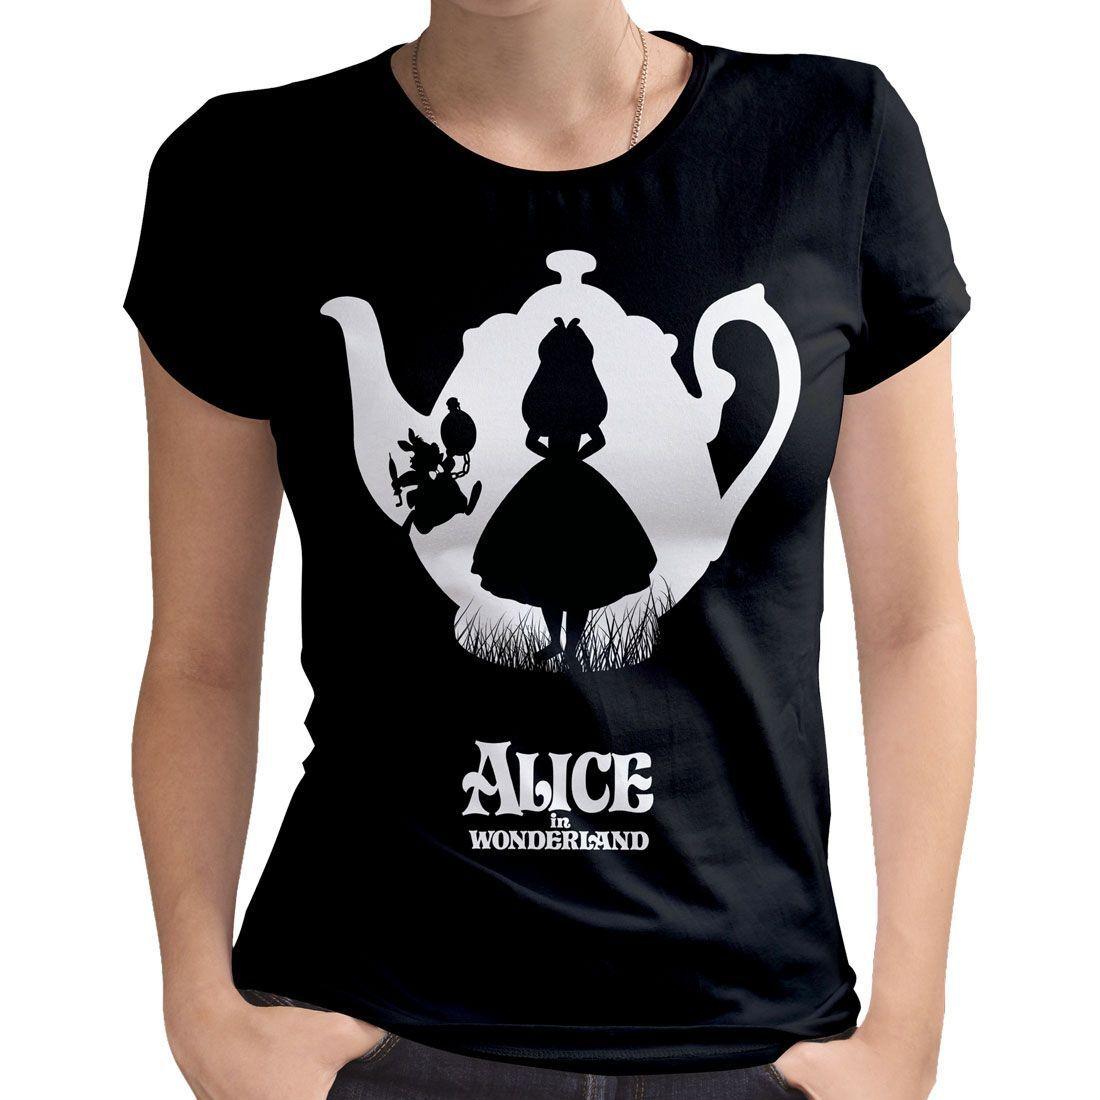 3377a2d45b9e8b Alice im Wunderland - Disney Vintage Damen Lizenz T-Shirt - Adventure  (S-XL)